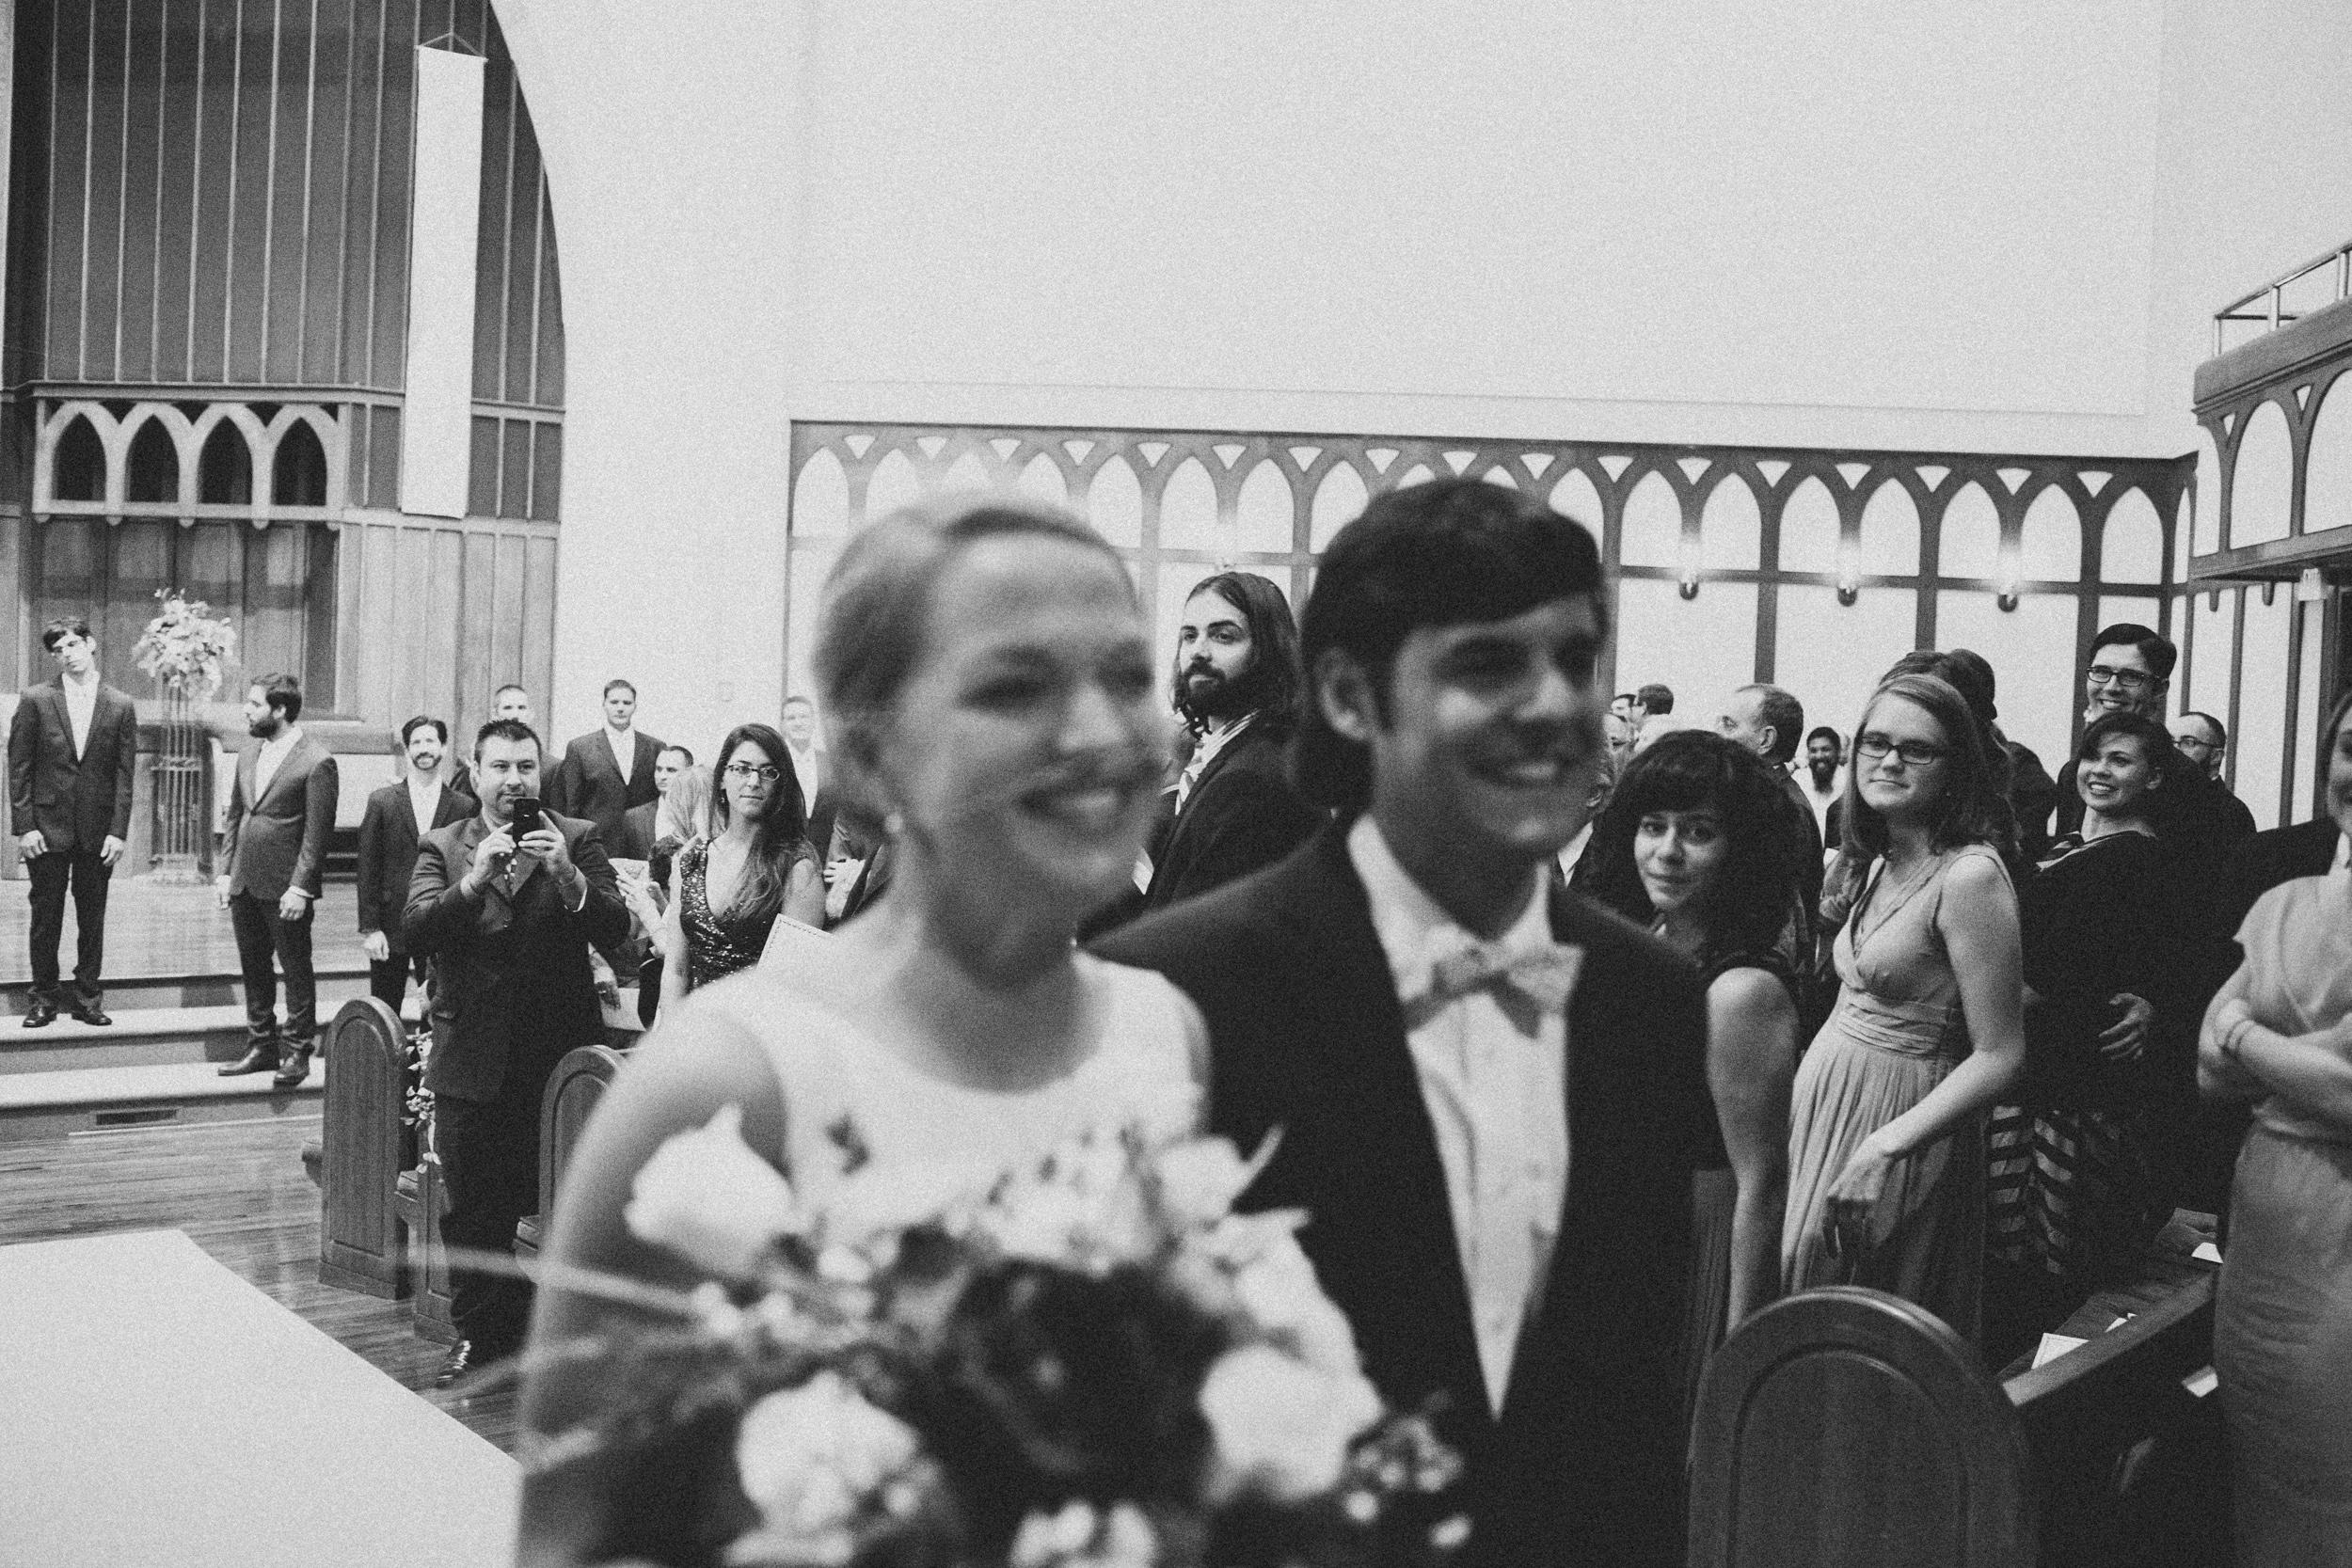 10-05-2013 maggie & adam wedding photography by brian milo-135.jpg